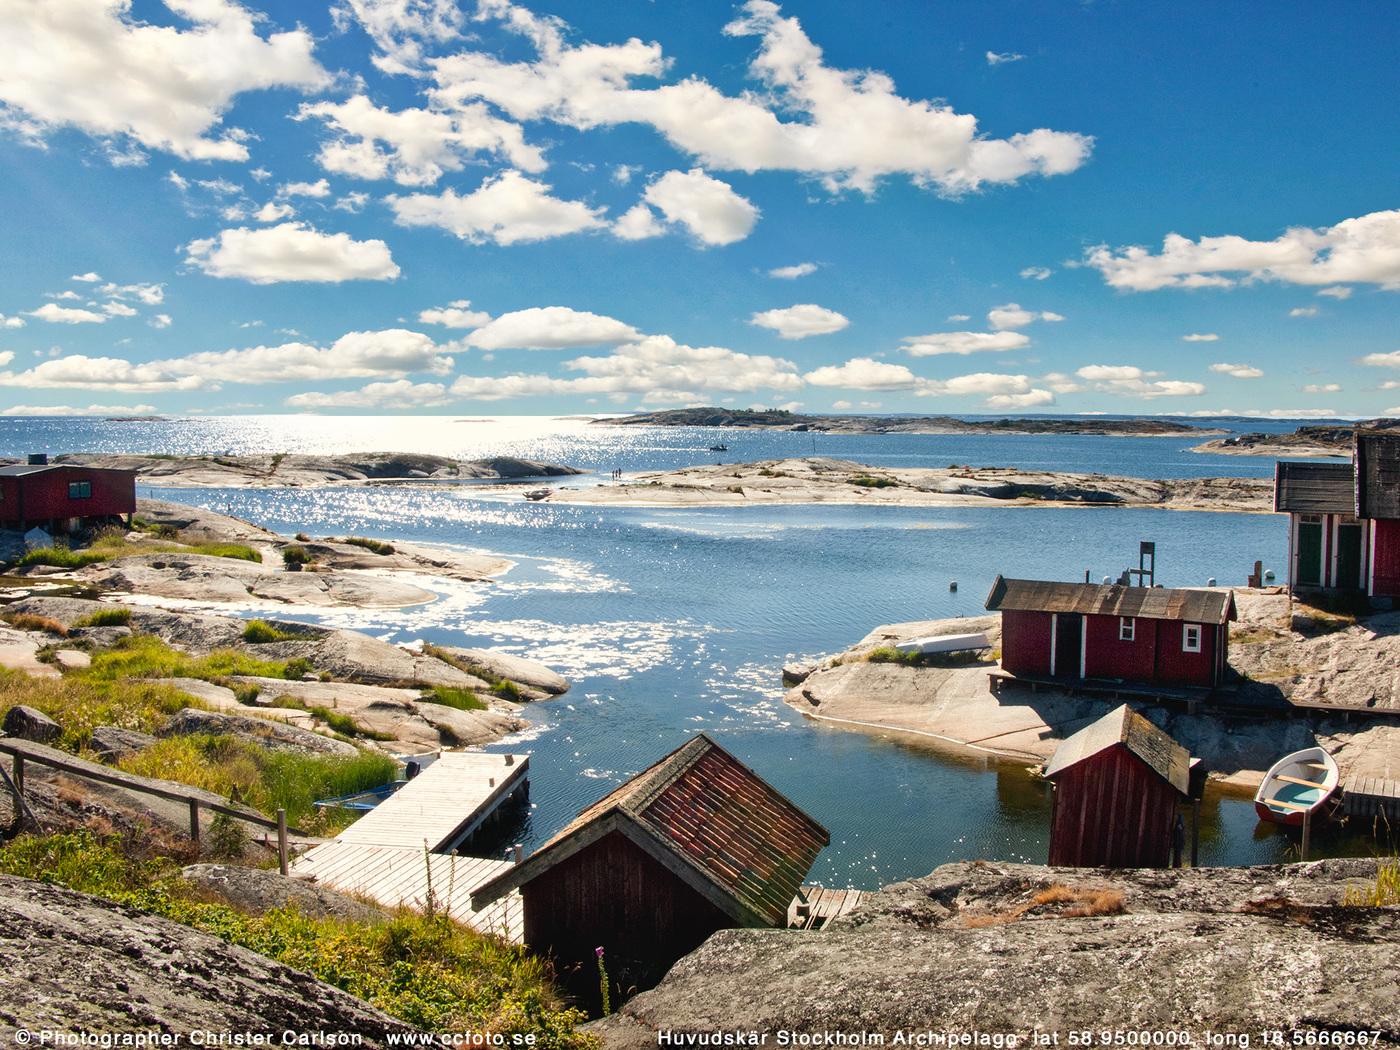 Christer Carlson - Environment   Landscape  Natur